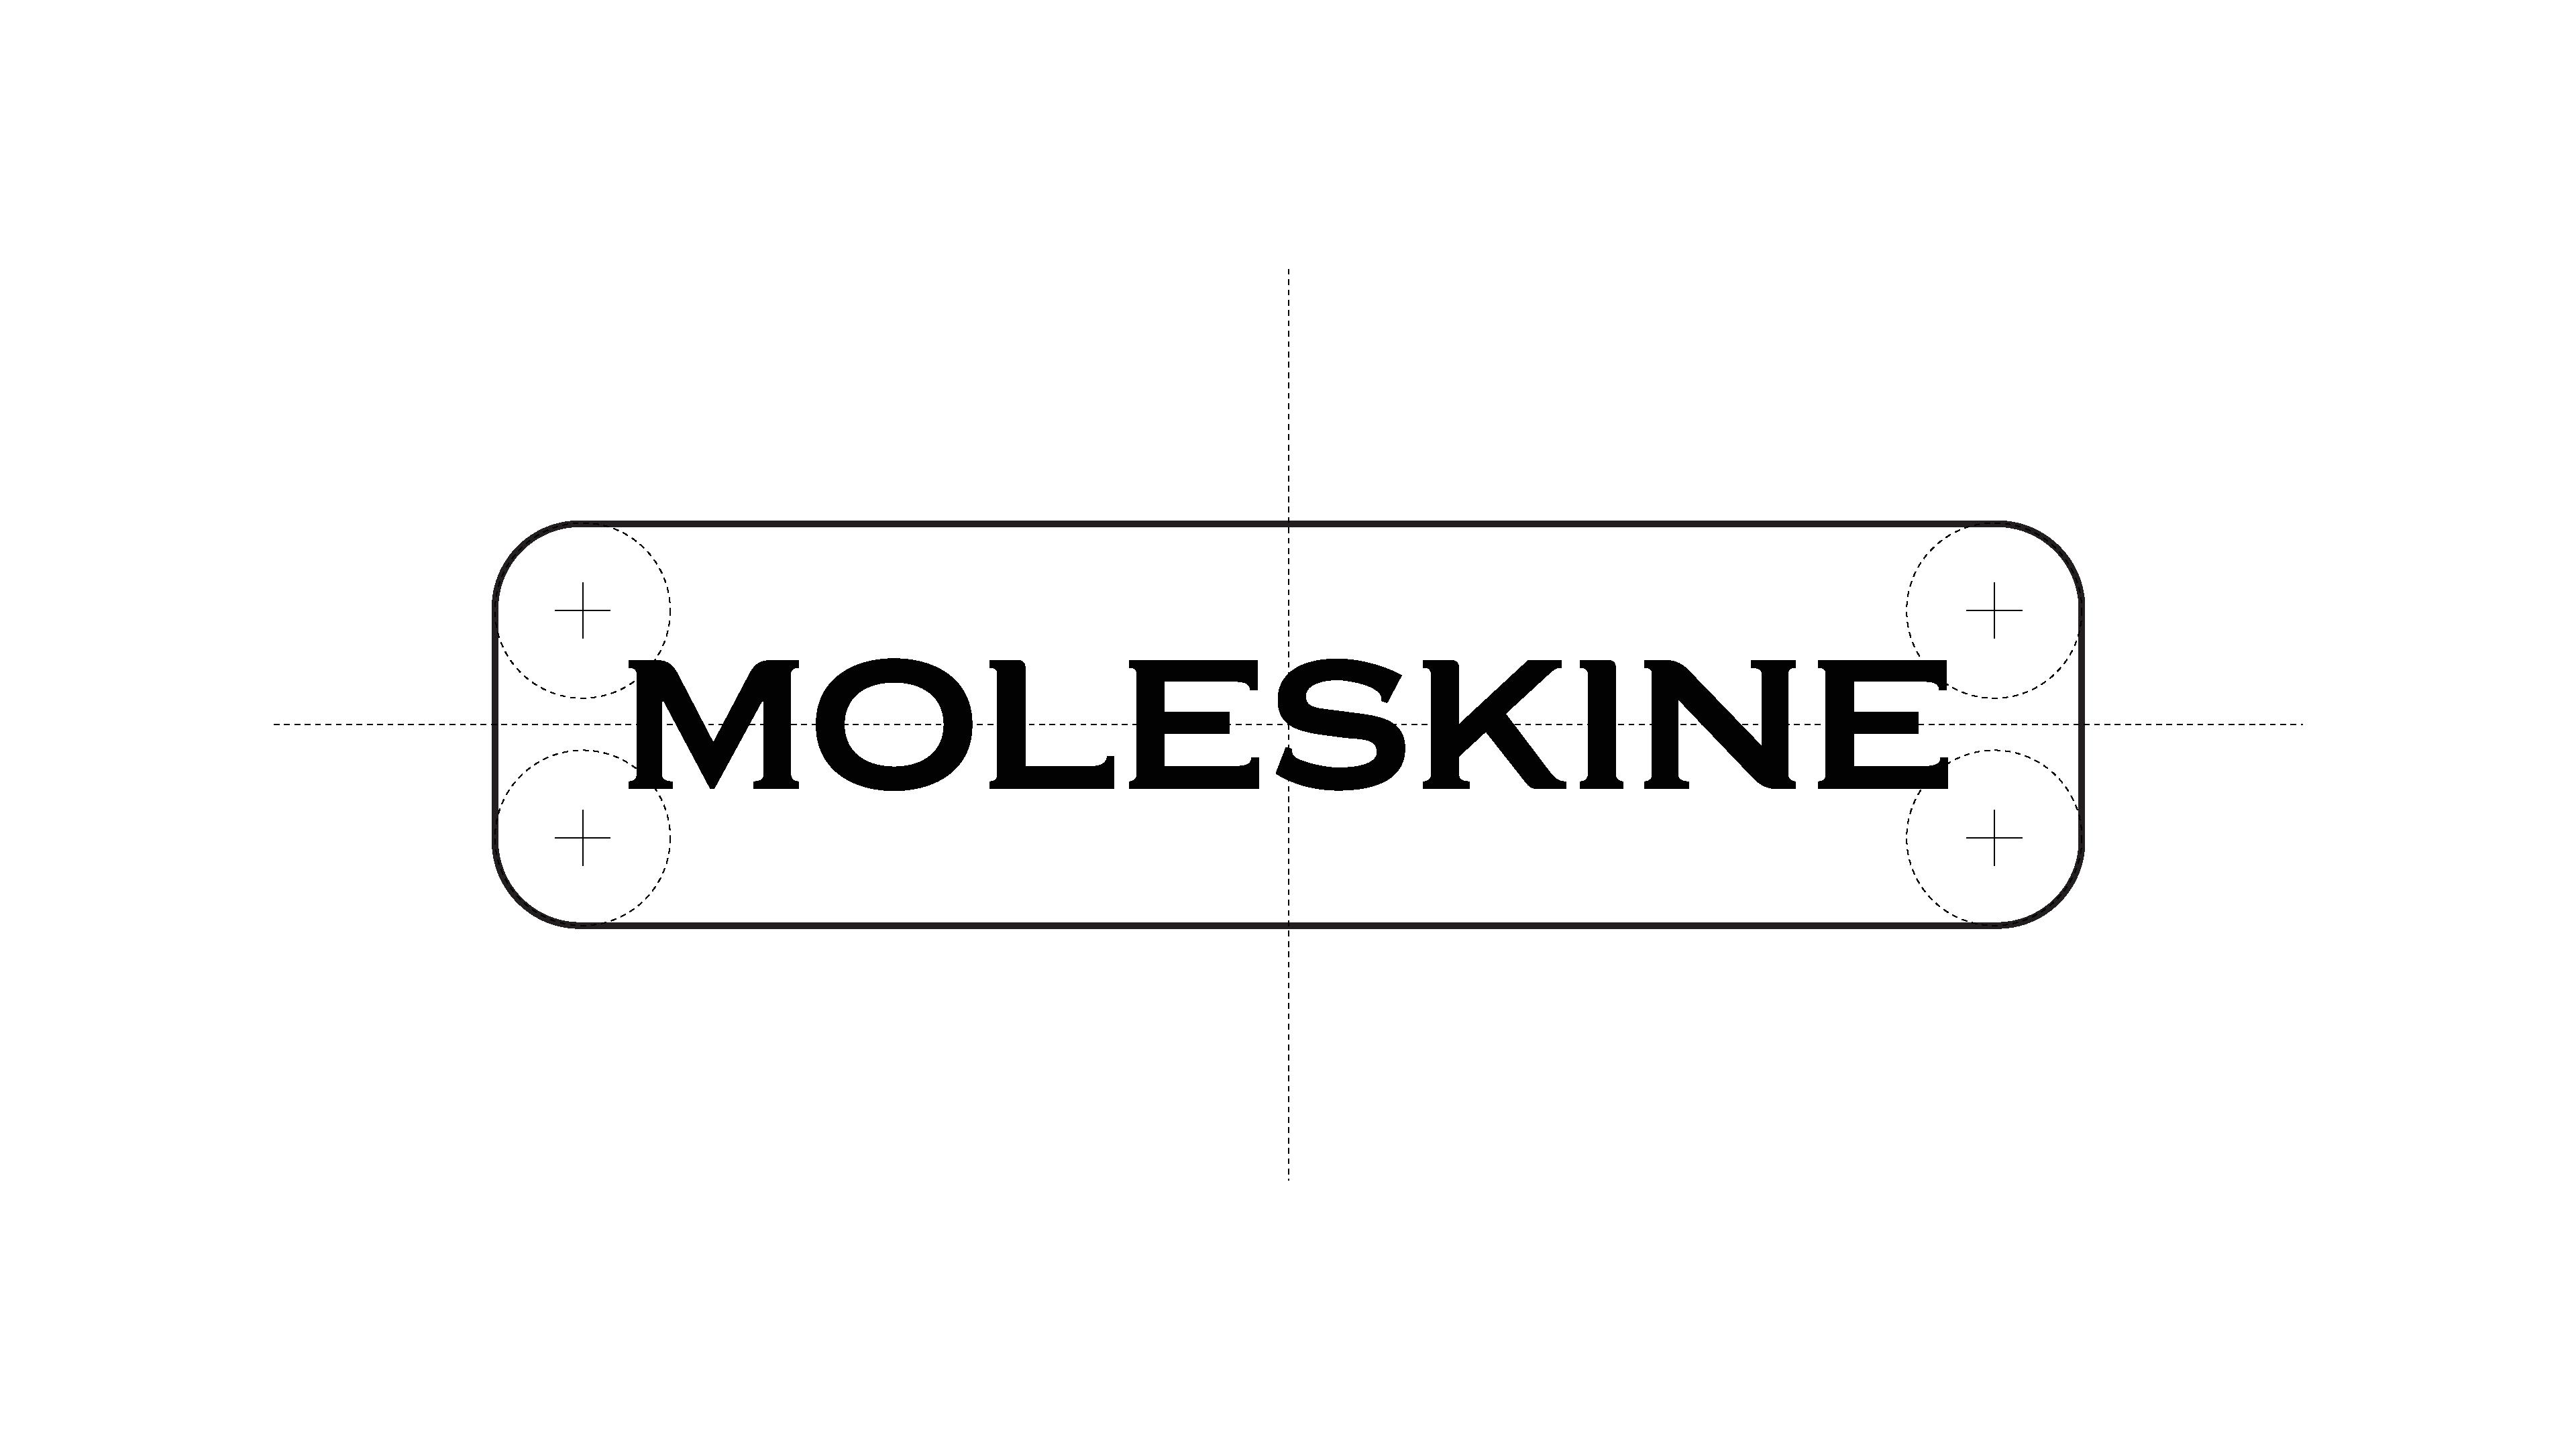 MOLESKINE-brand-identity-08